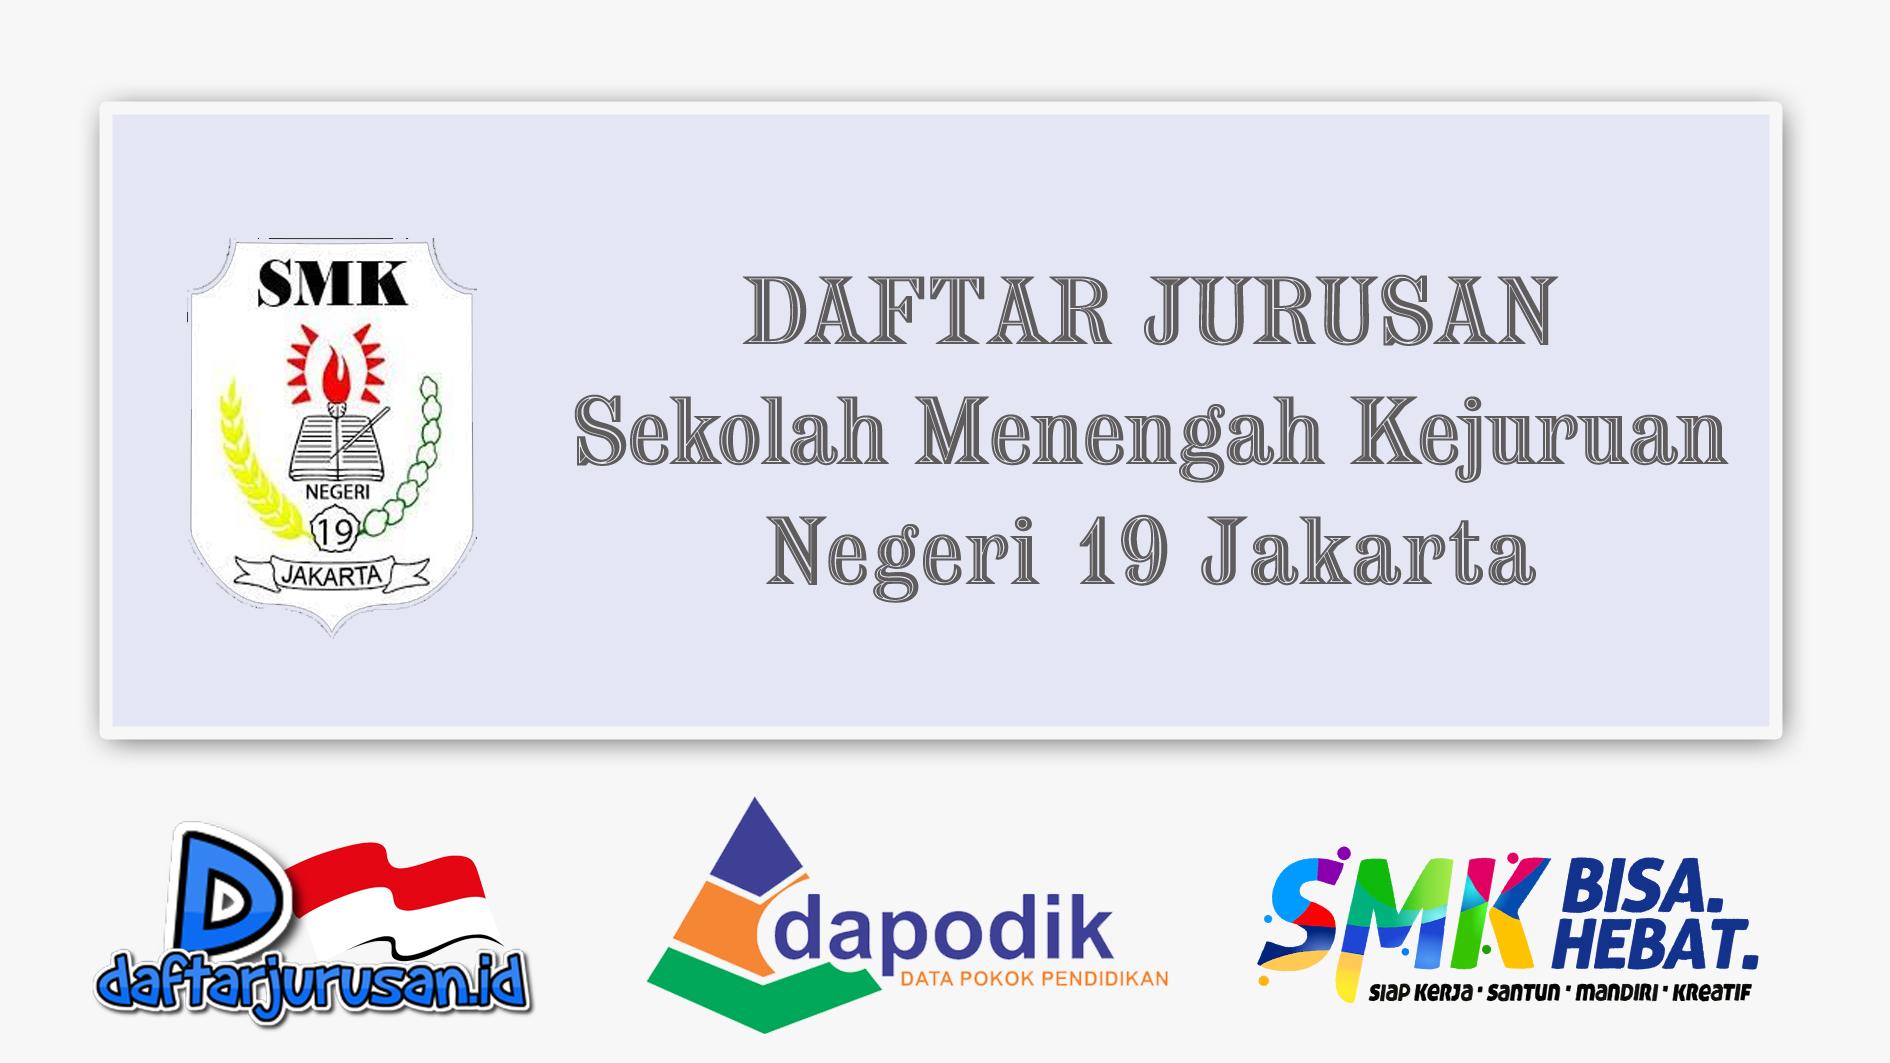 Daftar Jurusan SMK Negeri 19 Jakarta Pusat